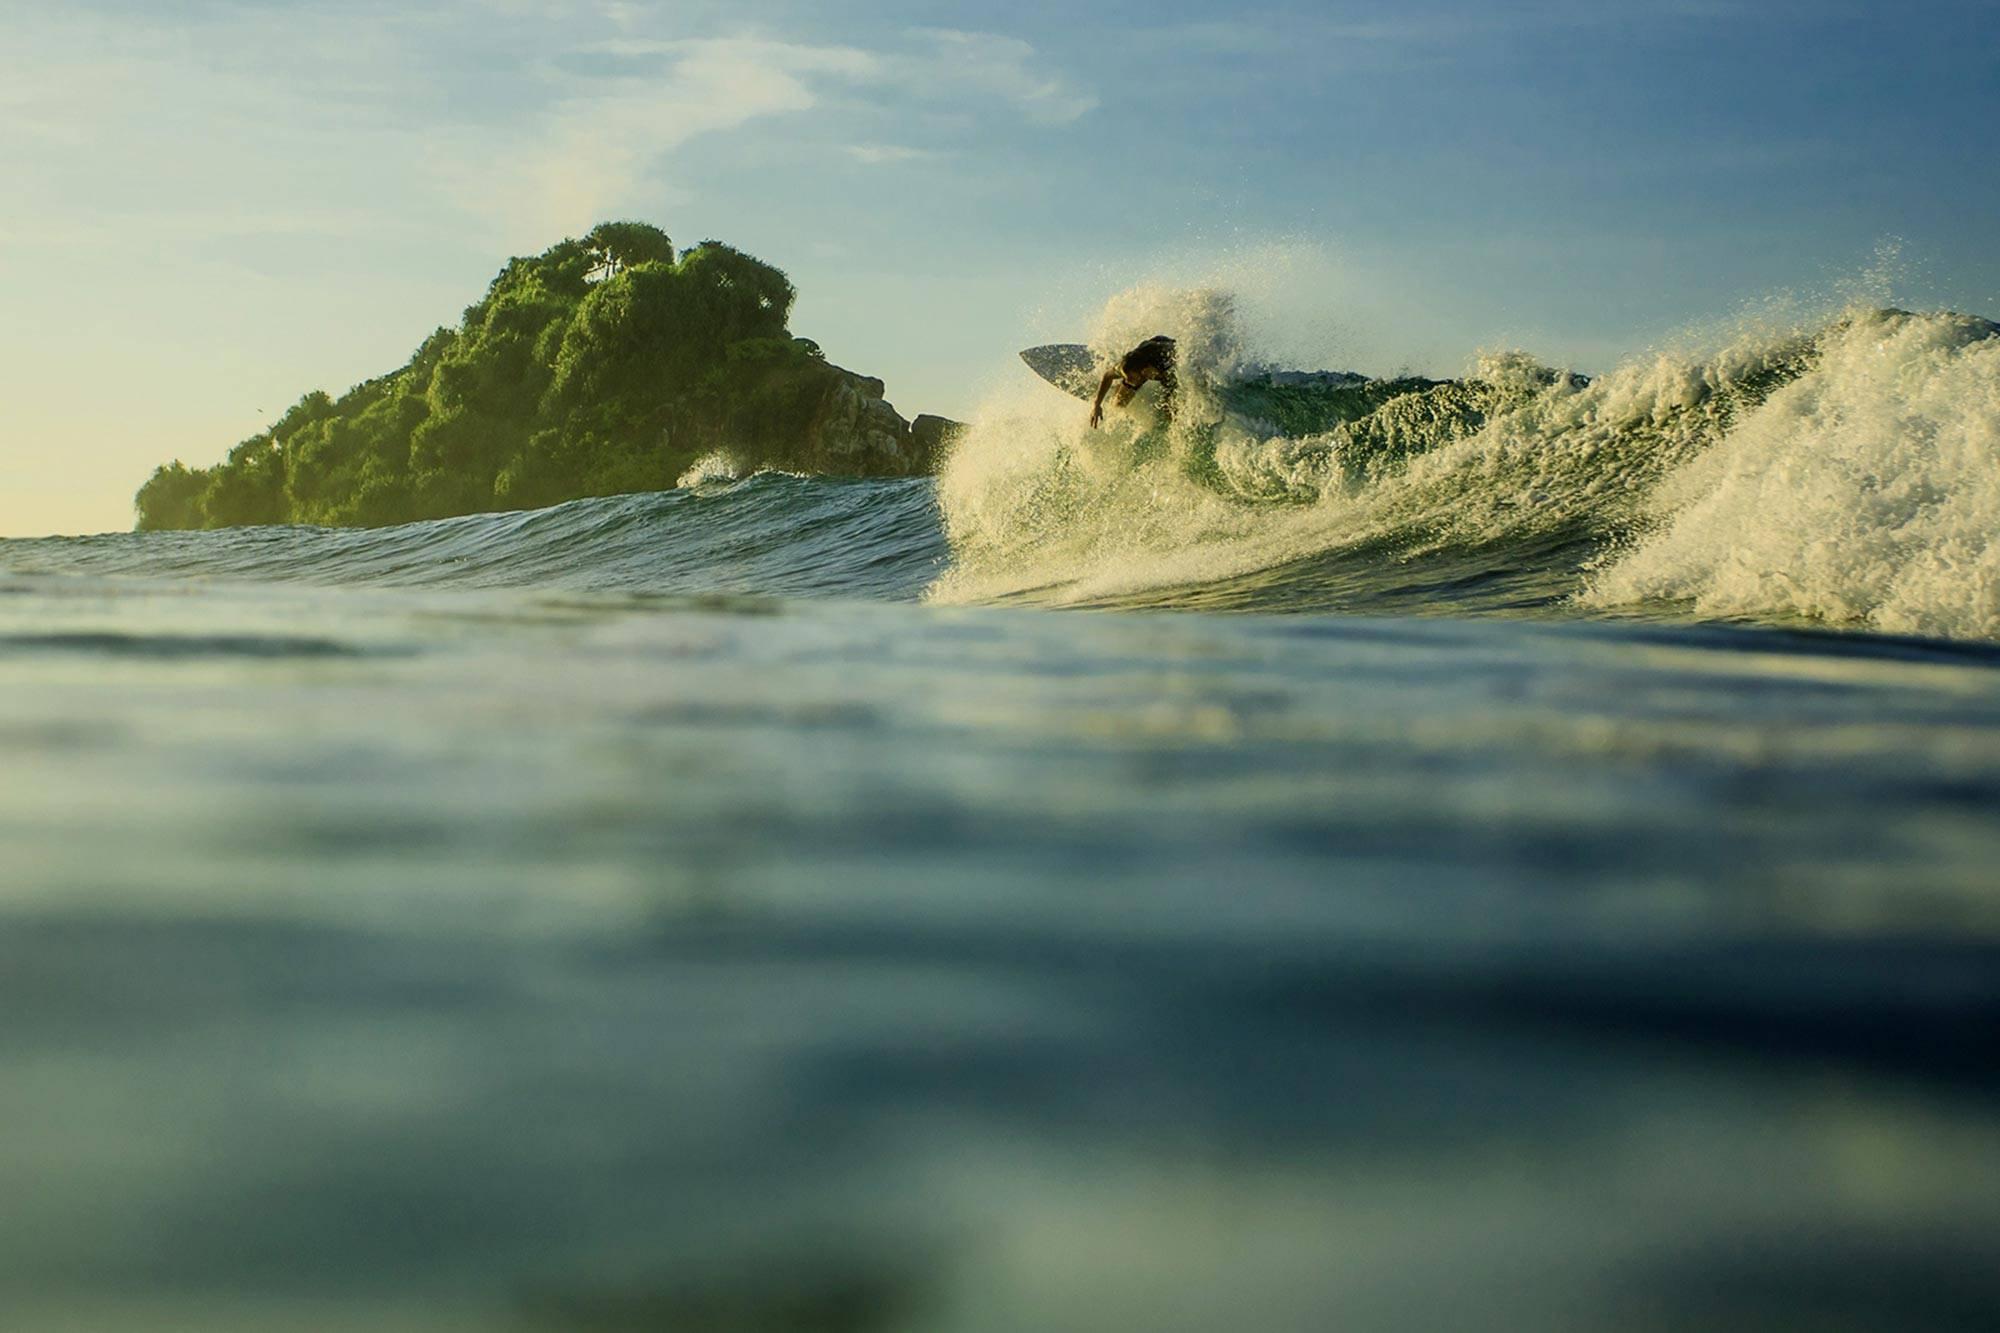 https://www.soulandsurf.com/wp-content/uploads/2021/09/RetreatsLanka-images-I11A8607.jpg